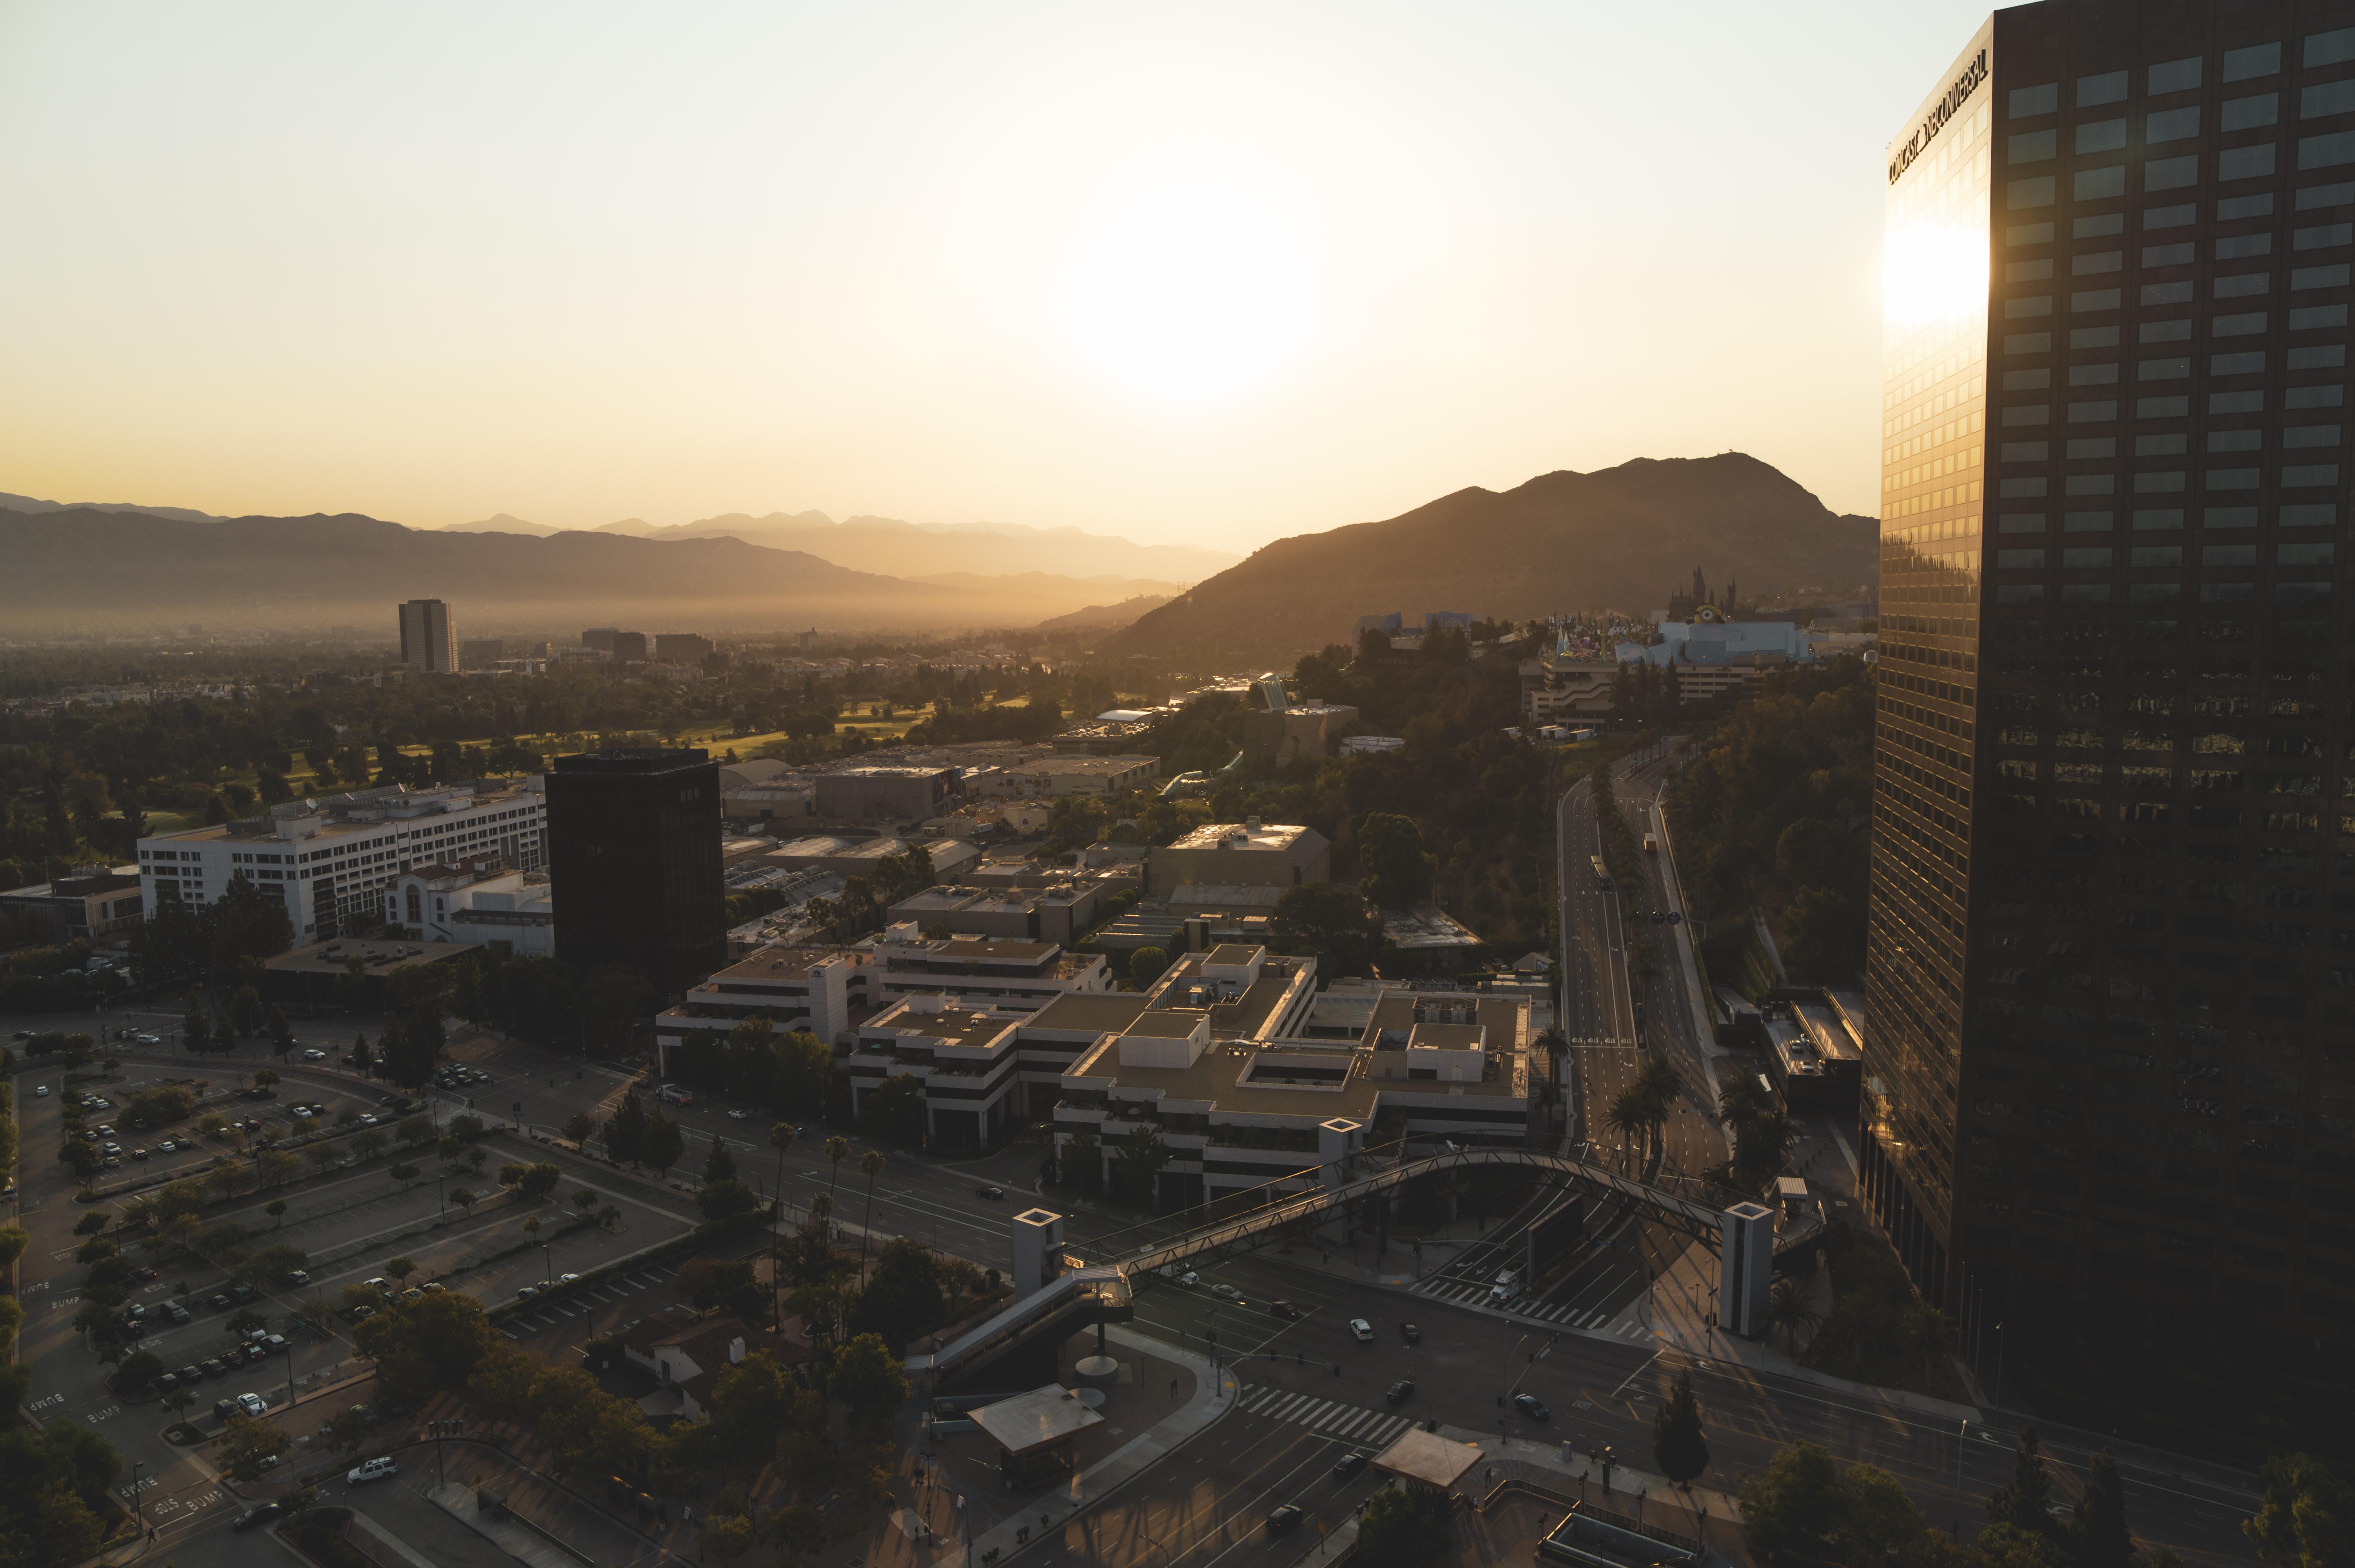 Sunrise in Universal City